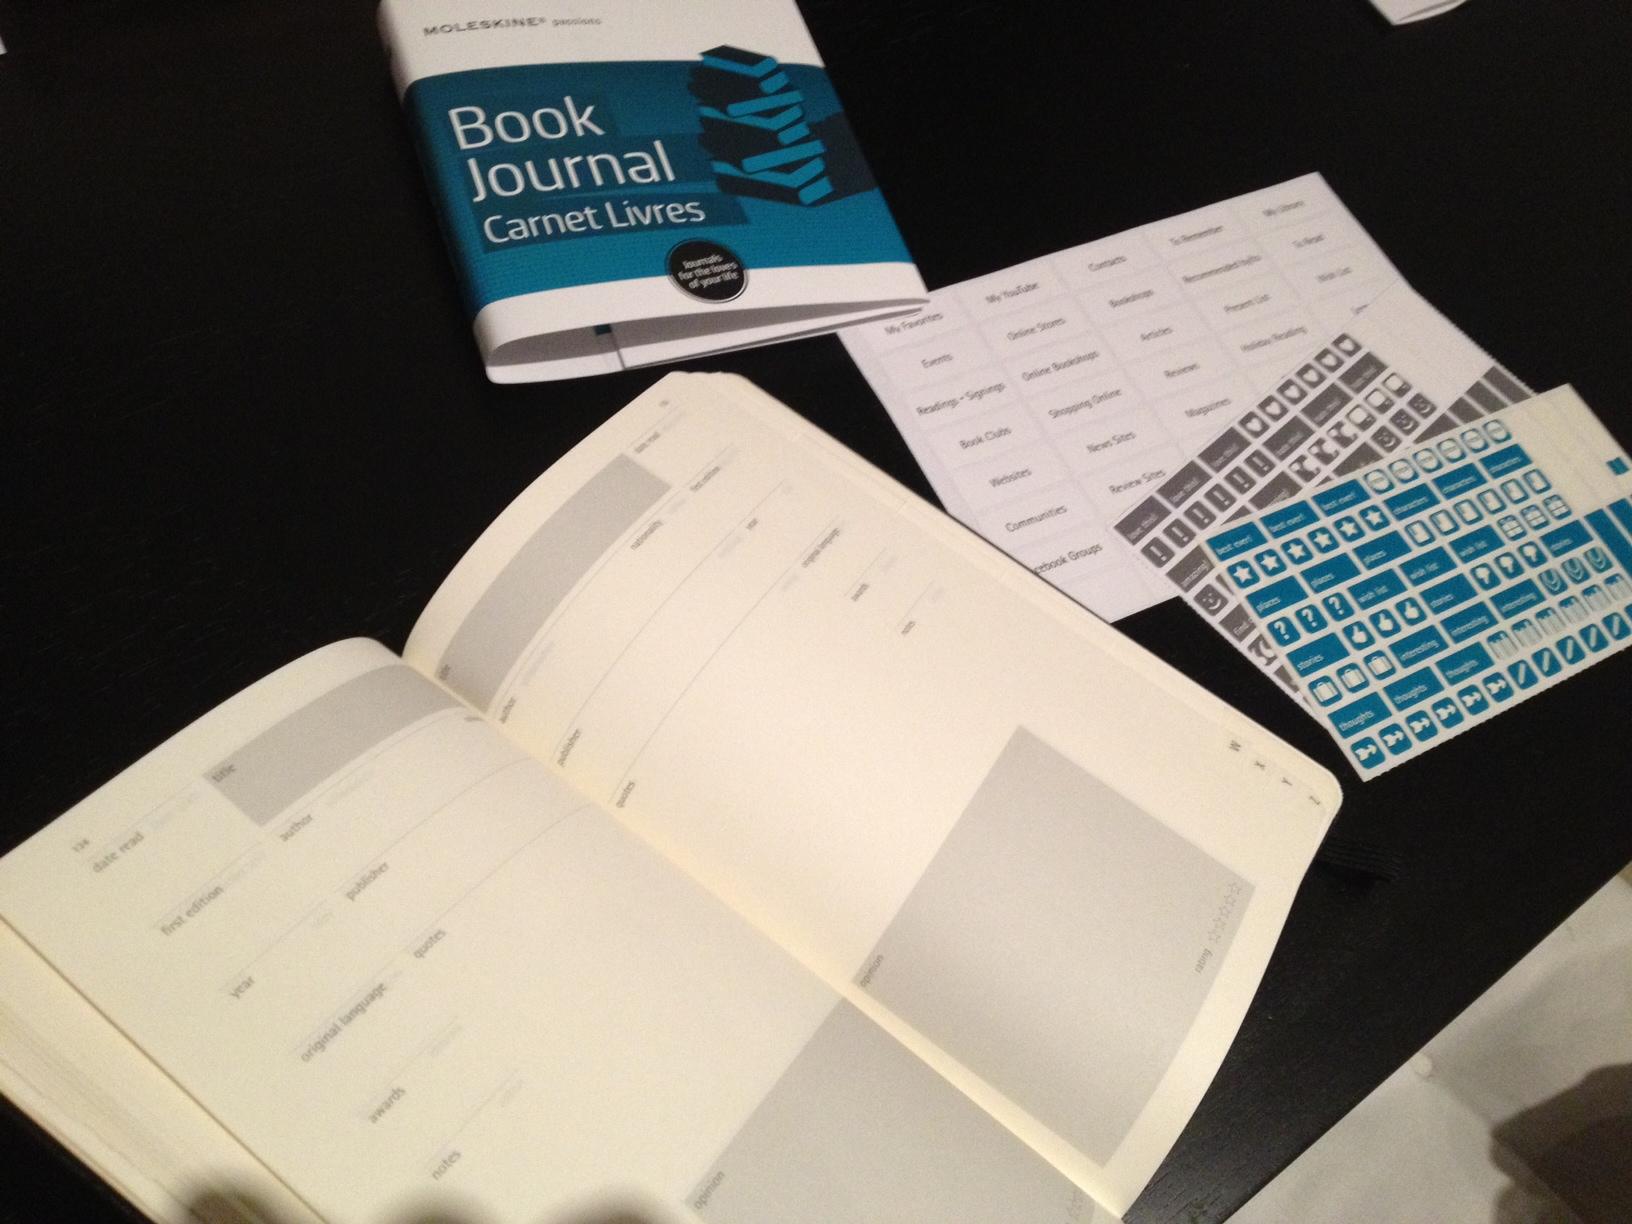 Moleskin Book Journal Inside -  Savannah Page, author